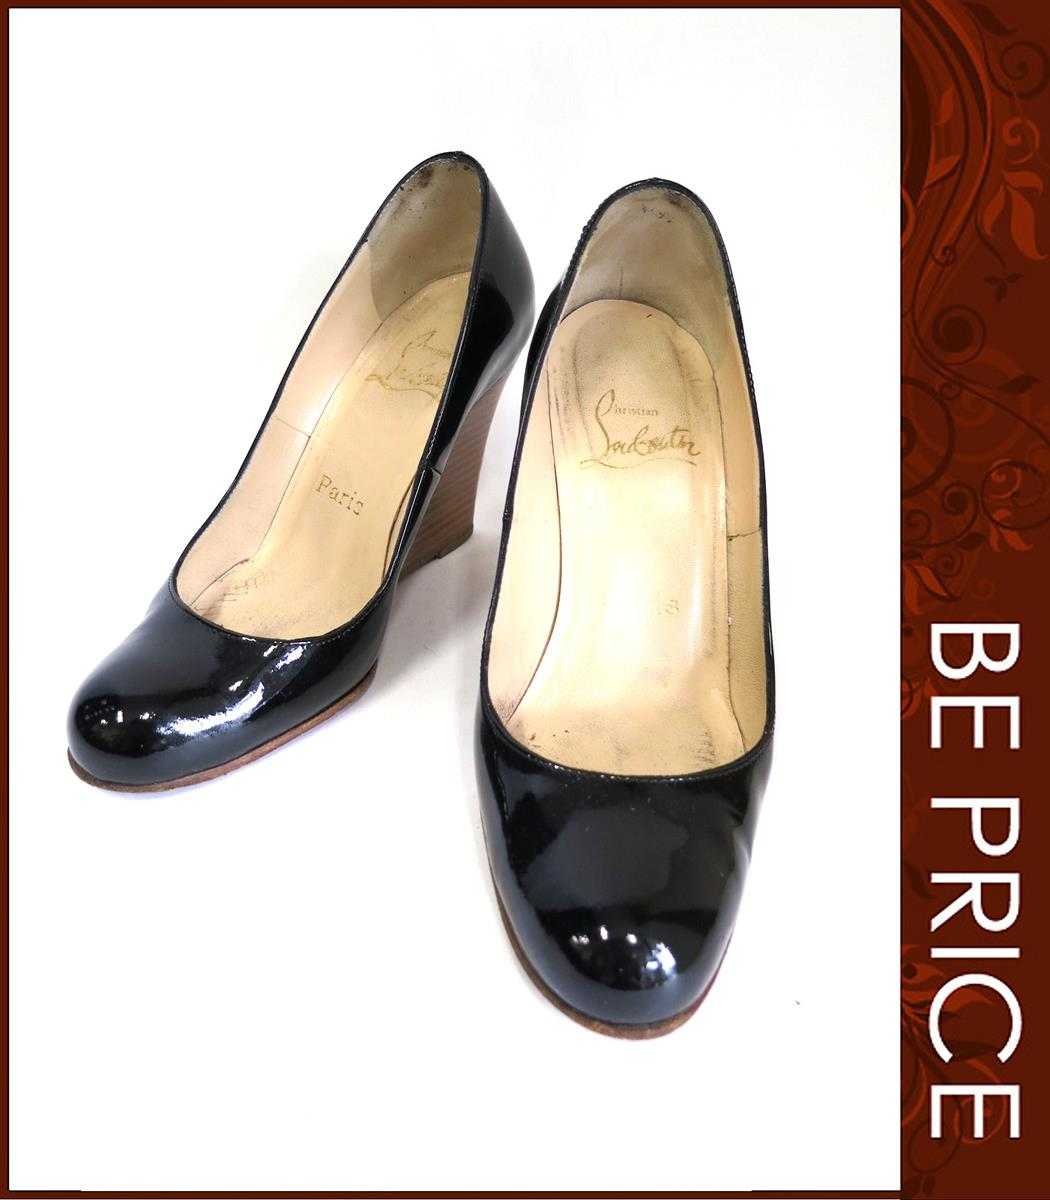 Christian Louboutin クリスチャンルブタン ウェッジソールパンプス パテント靴【35】【Bランク】【中古】ts280326